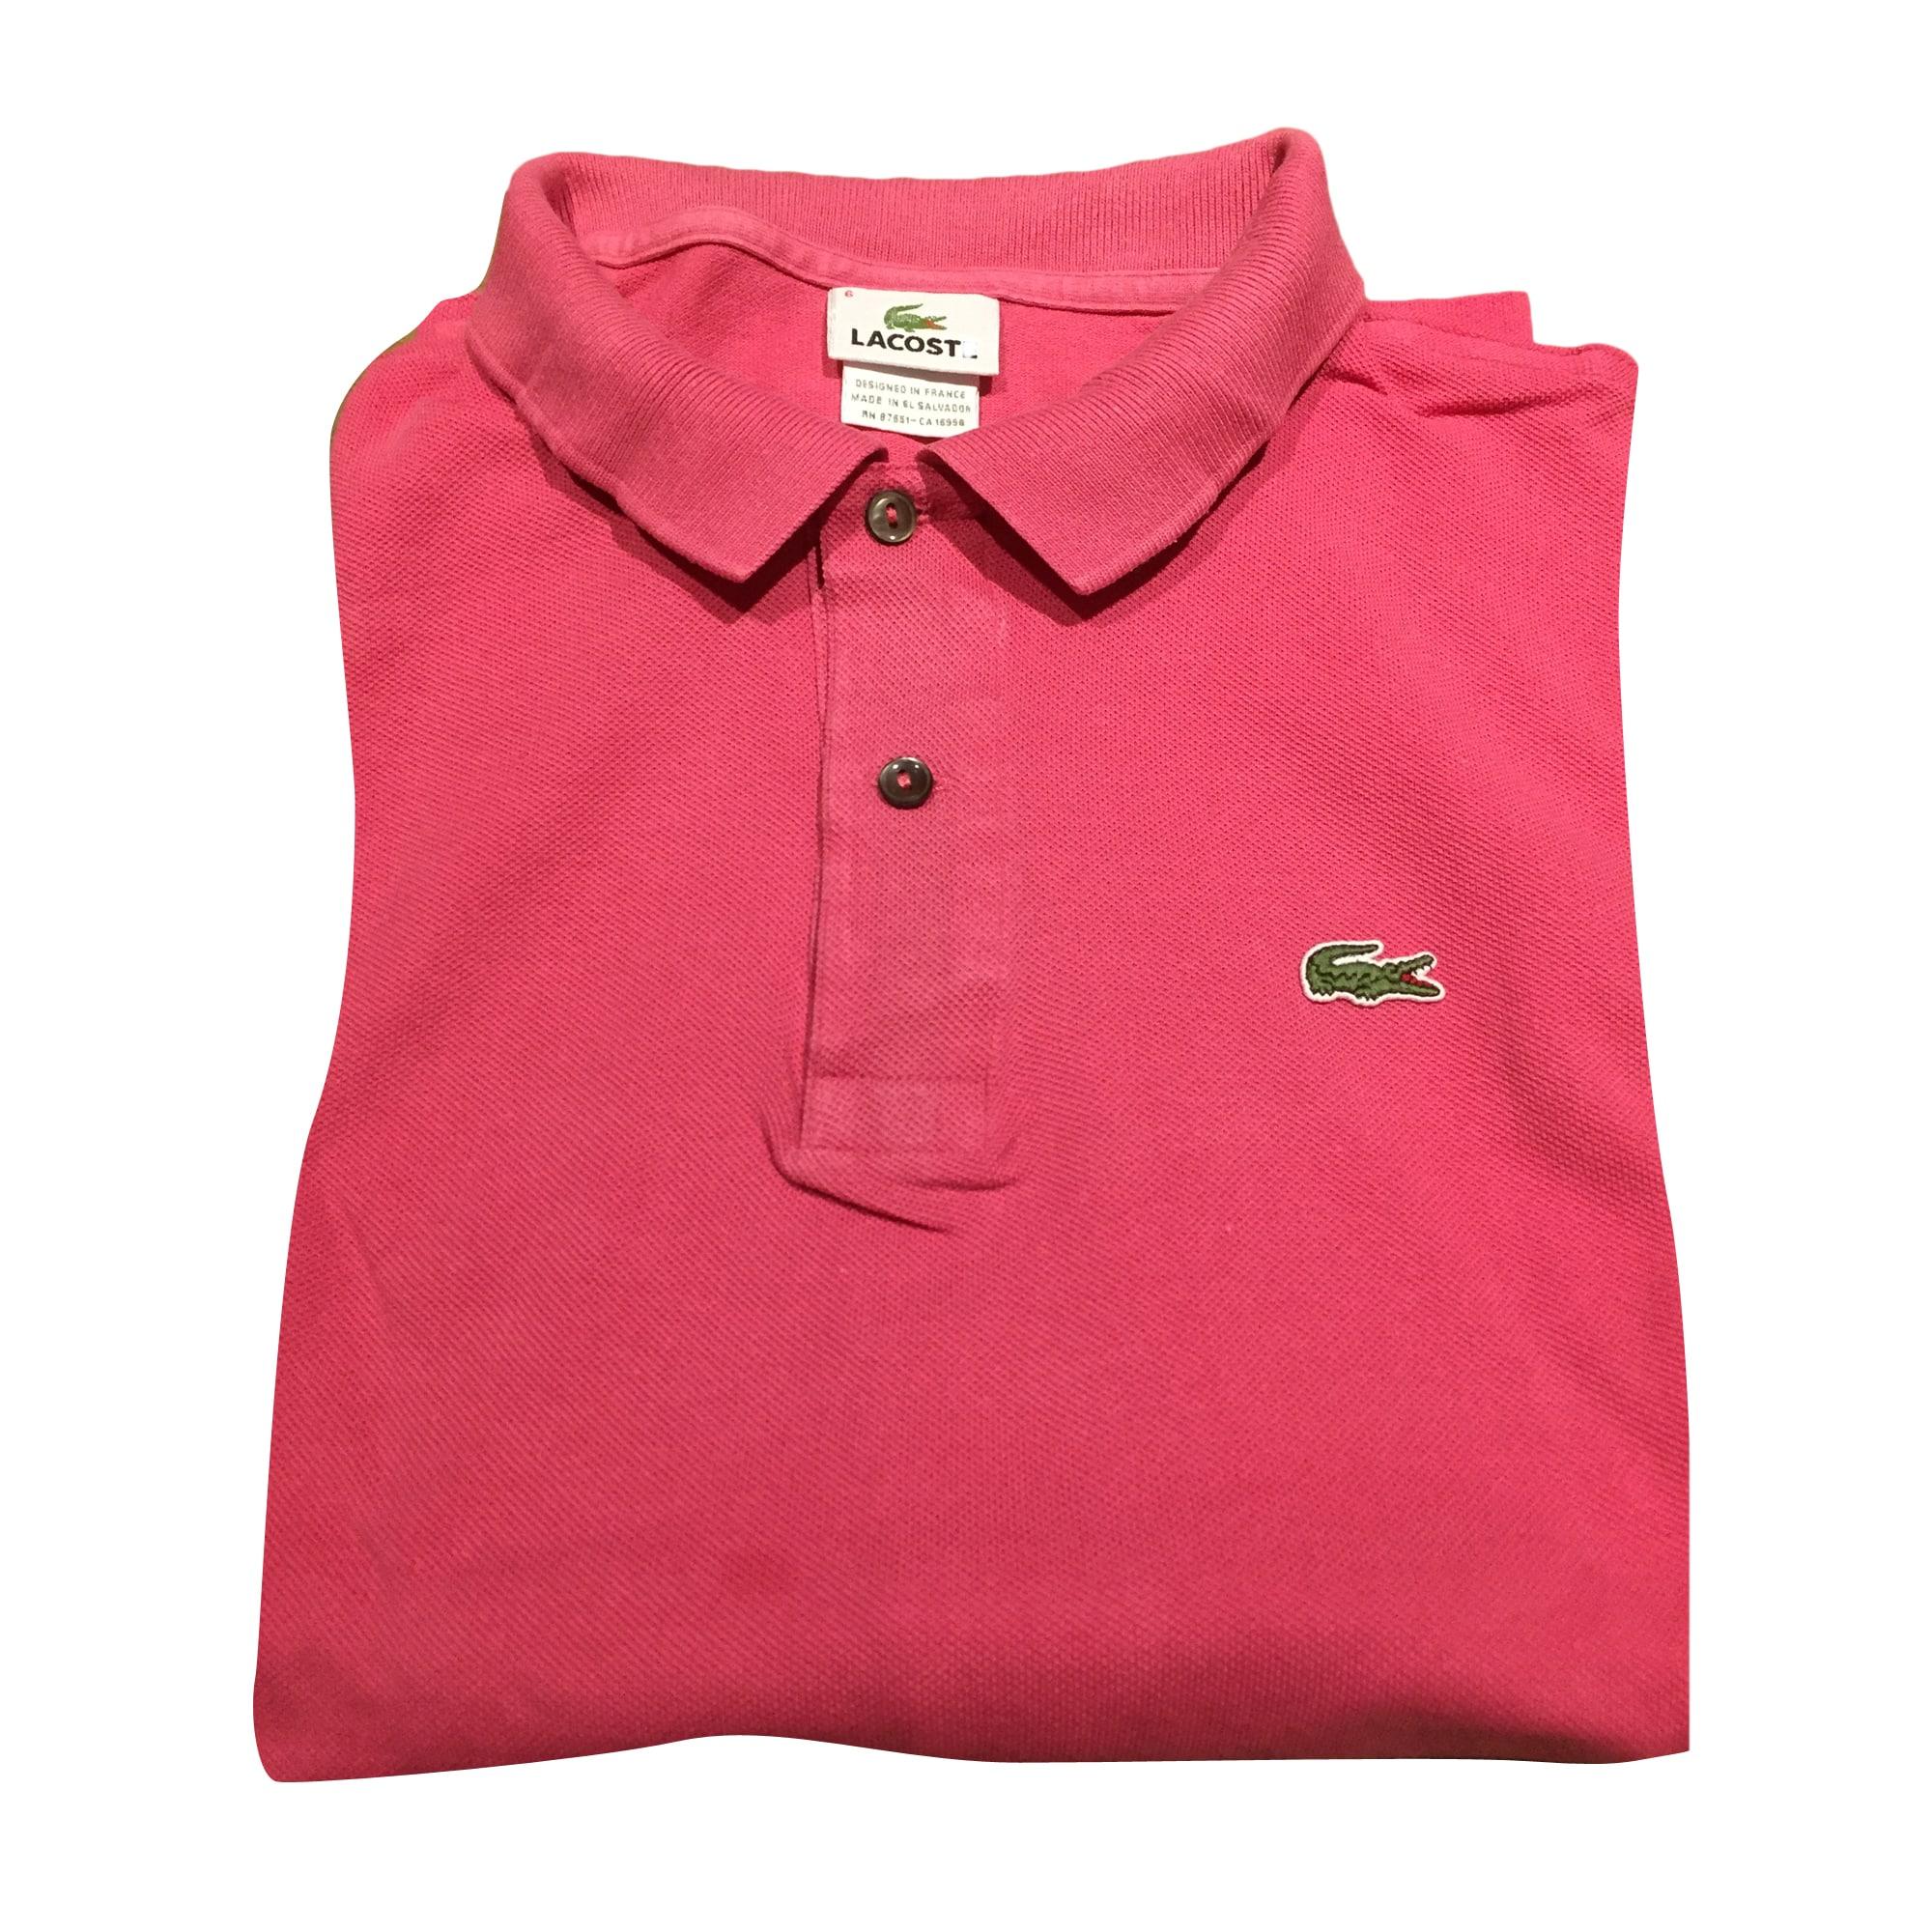 Polo LACOSTE 4 (XL) pink vendu par Titi 504 - 6152230 bd0012f6ca